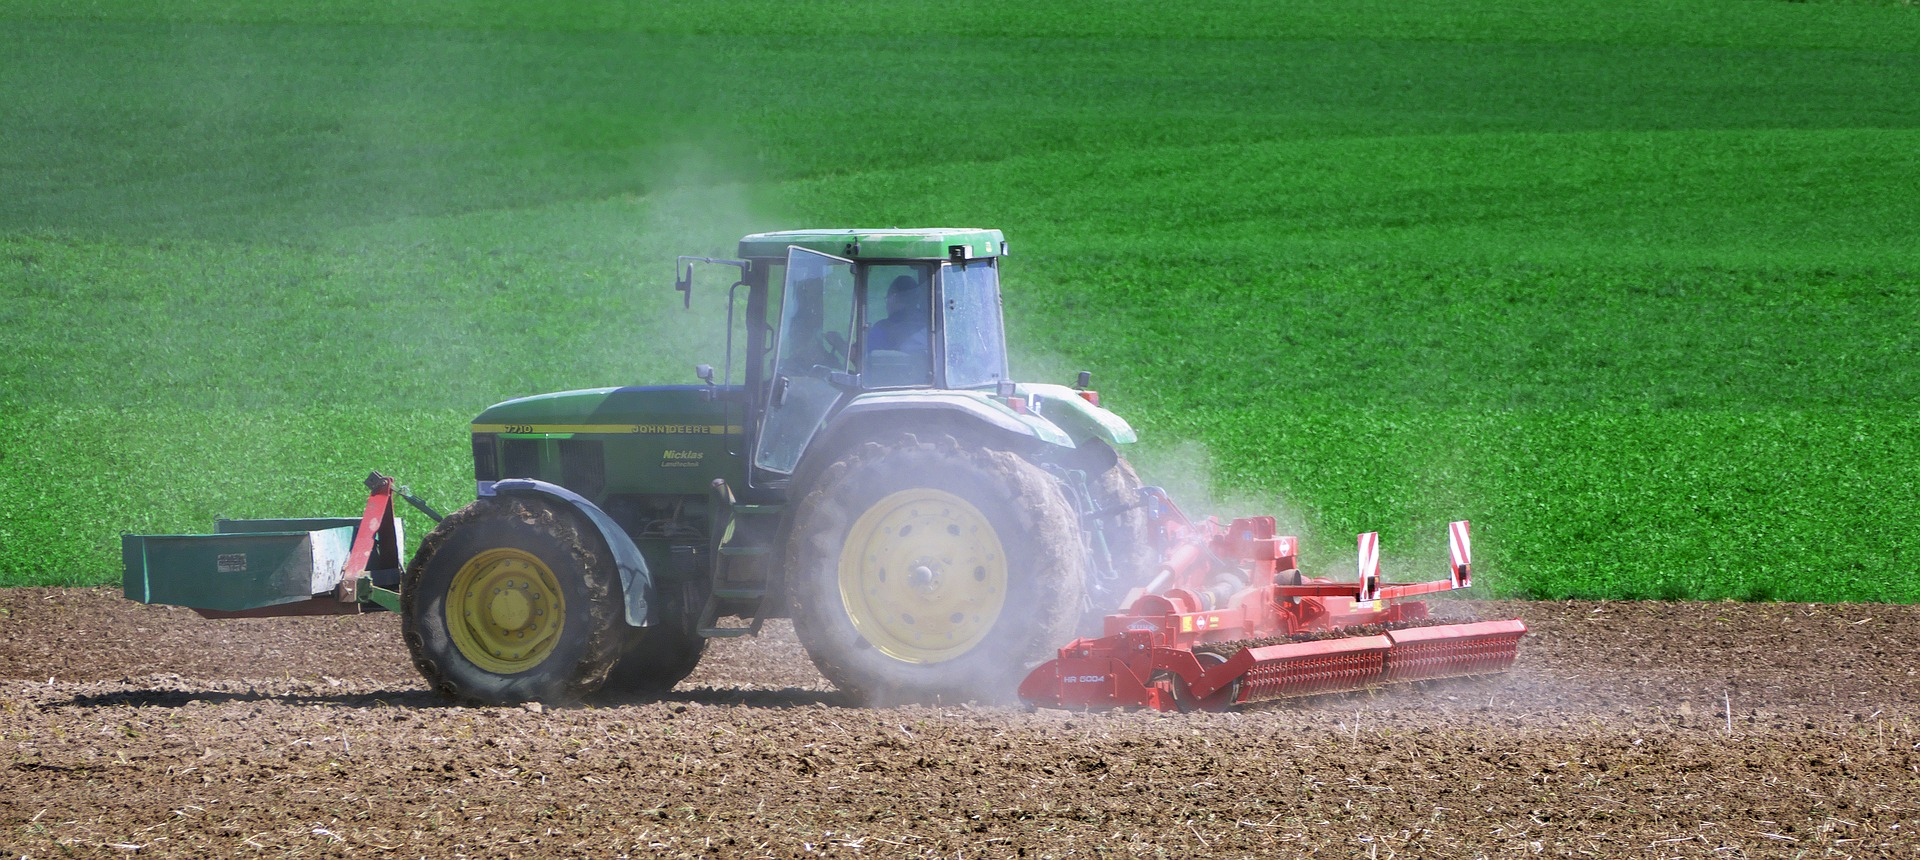 Agricultura / Pixabay / empregos